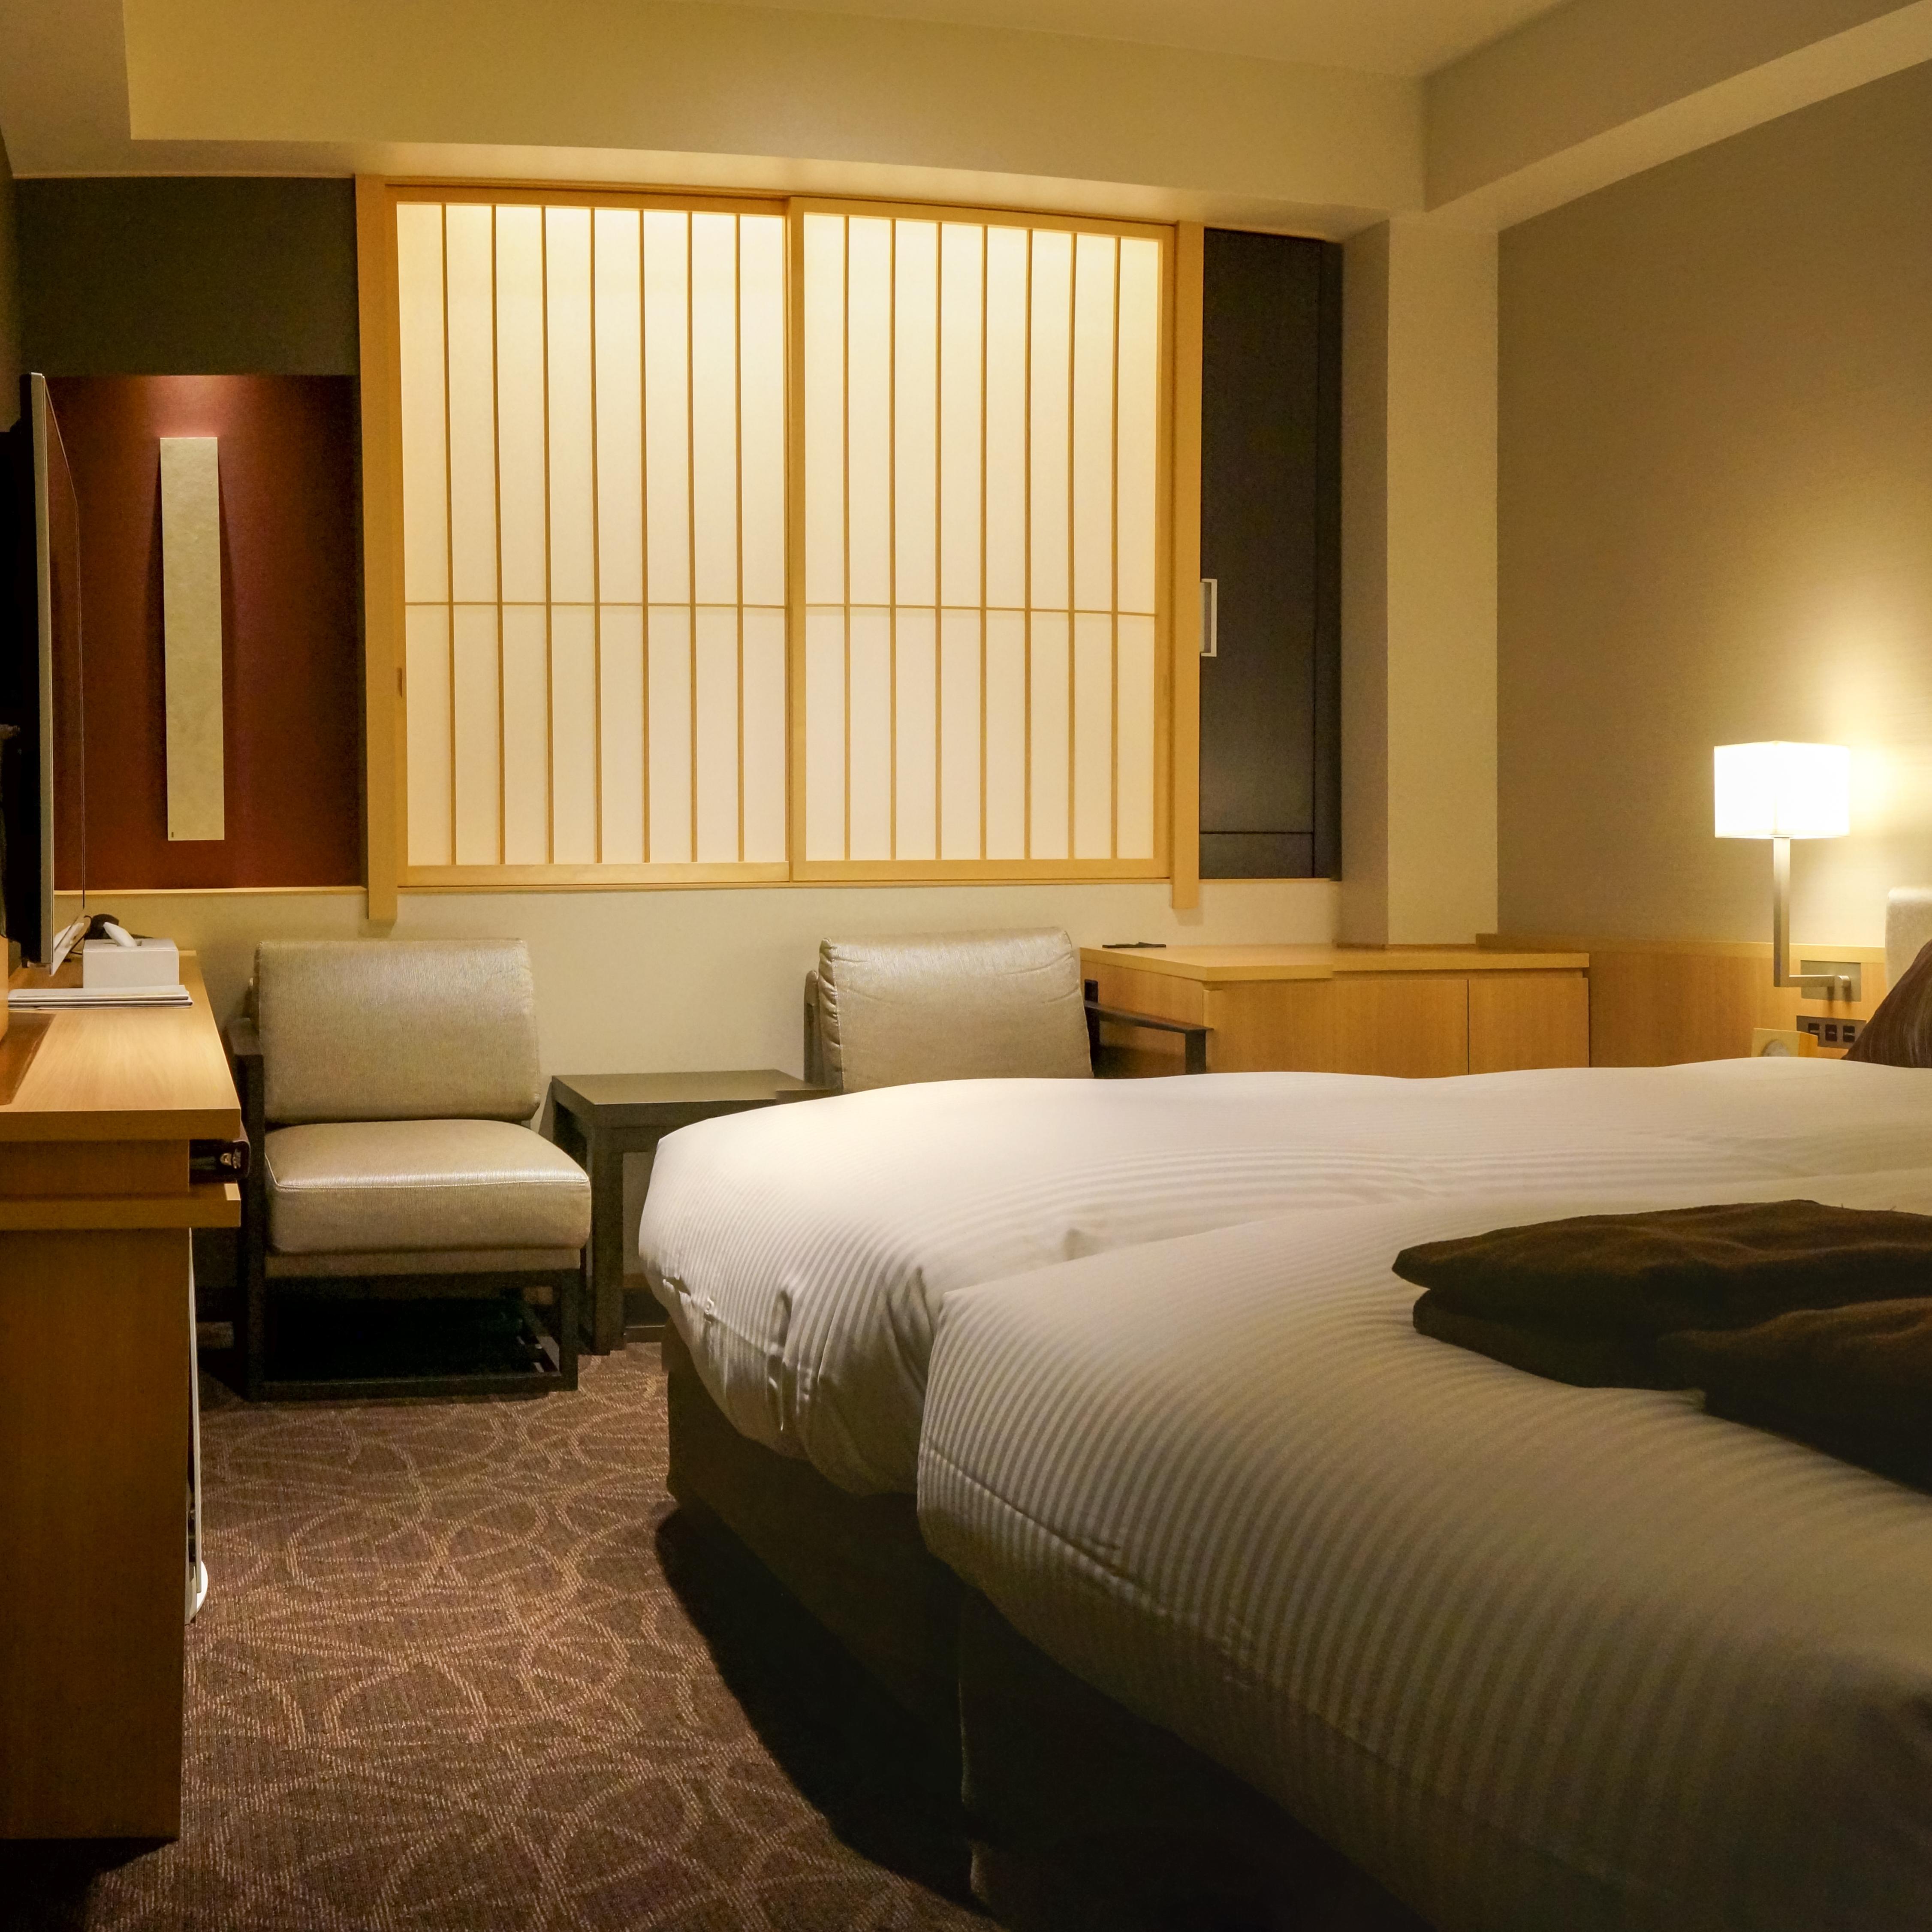 Superb File:Mitsui Garden Hotel Kyoto Shinmachi Bettei Moderate Twin Bedroom  20140506 001